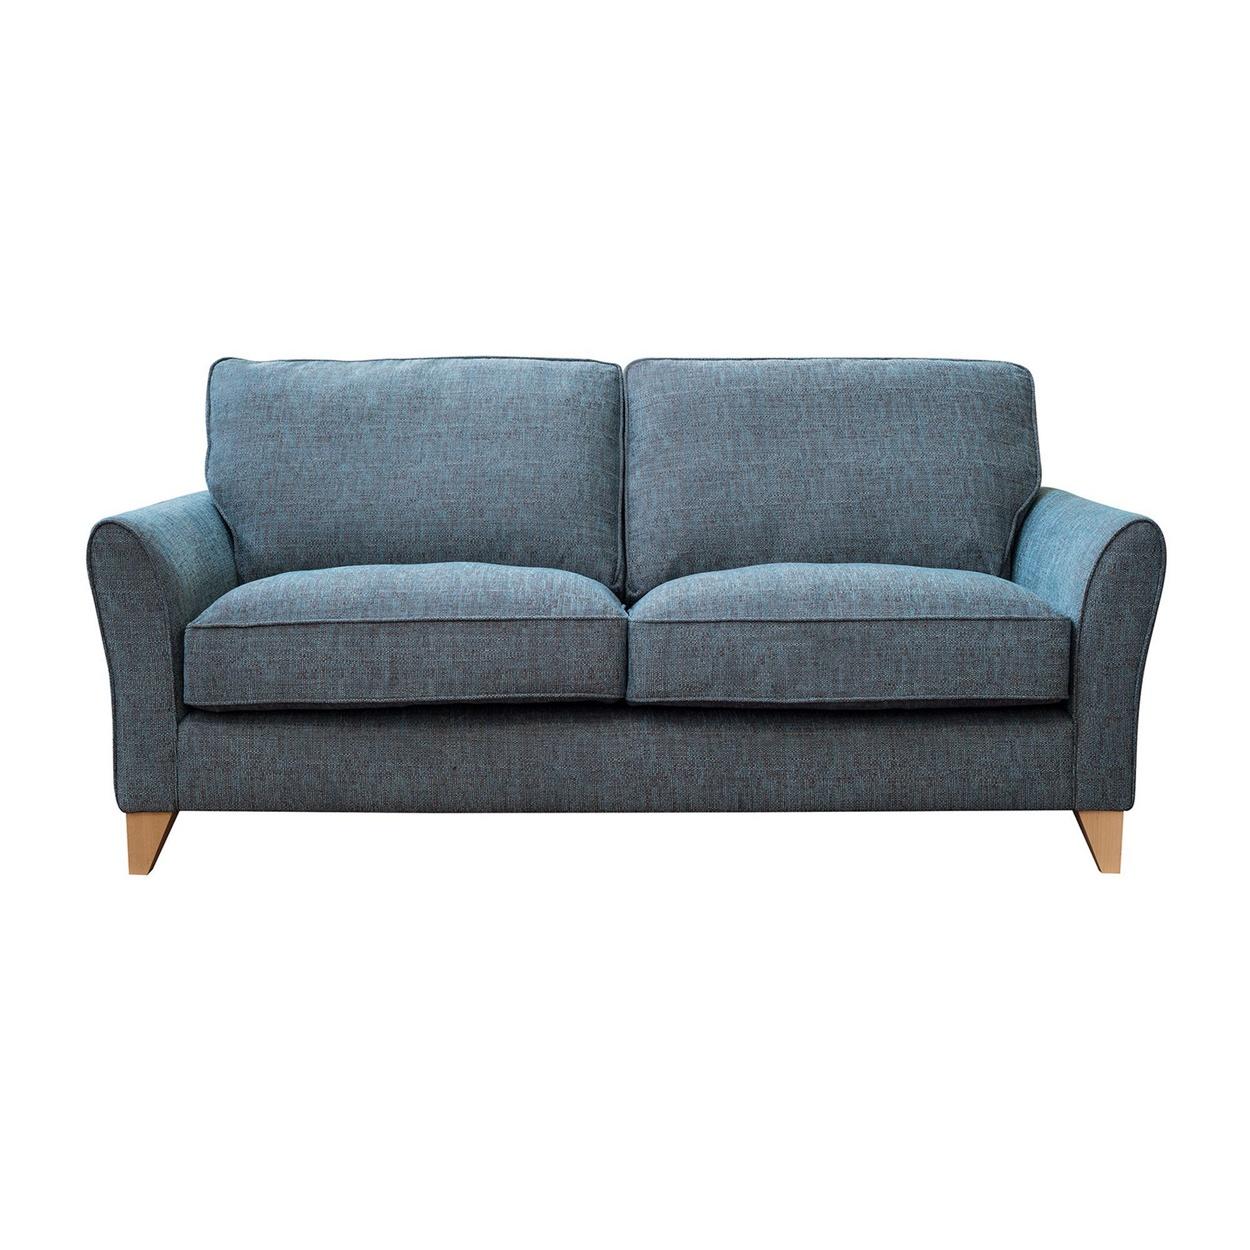 Debenhams Chesterfield Sofa Bed Review Refil Sofa